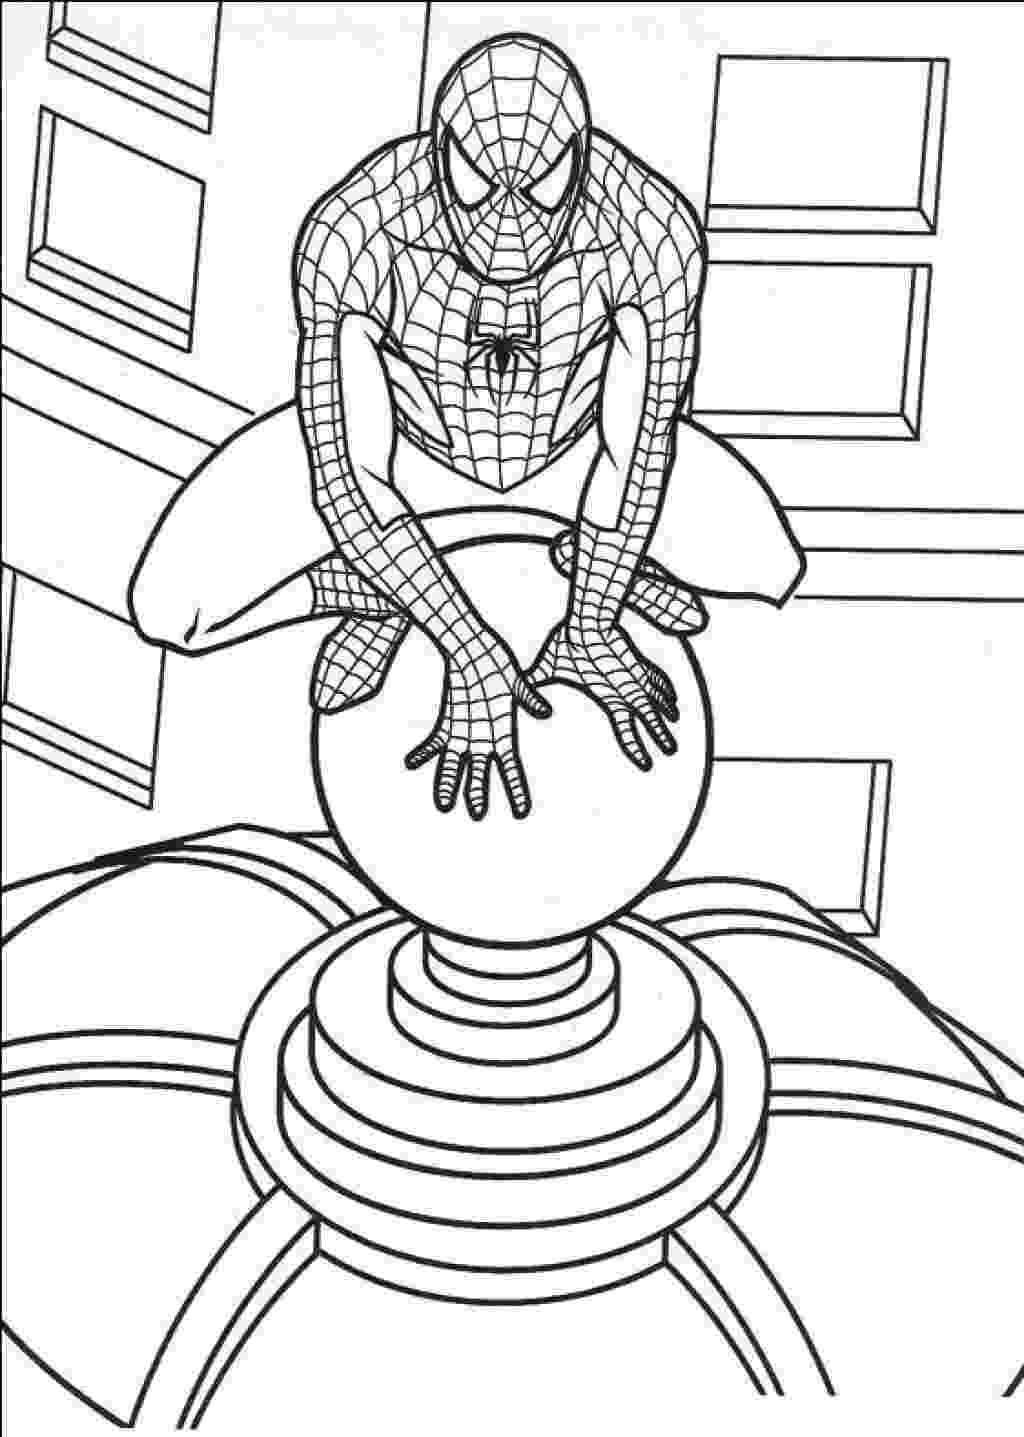 spiderman printout the amazing spider man coloring pages spiderman color printout spiderman 1 1